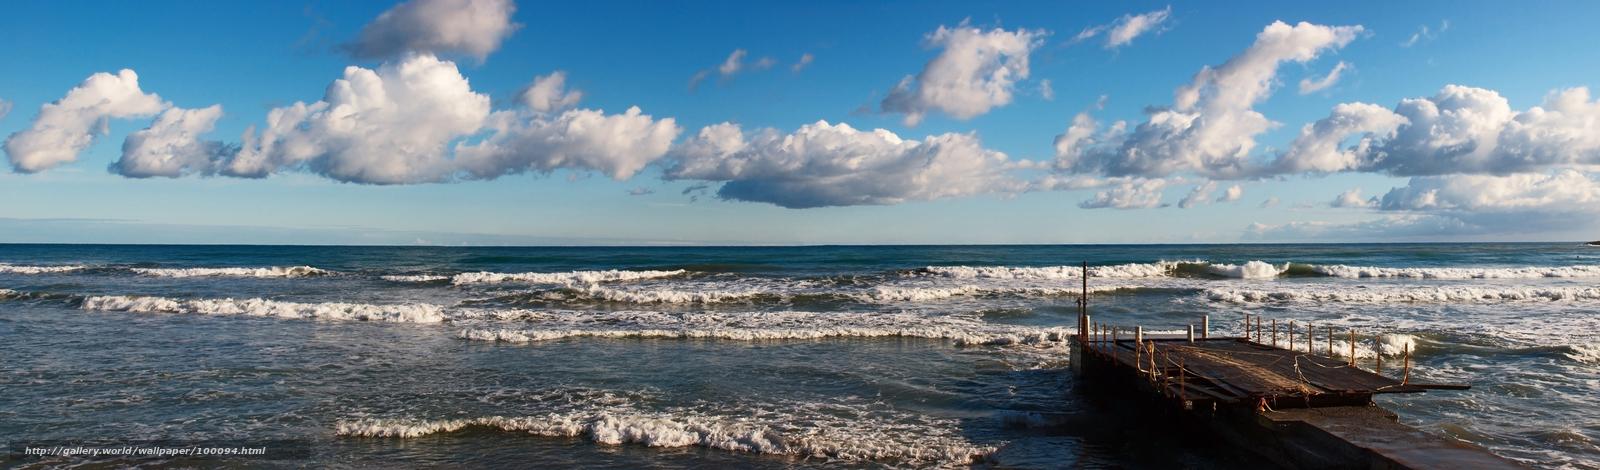 travel sea wallpaper panorama - photo #24